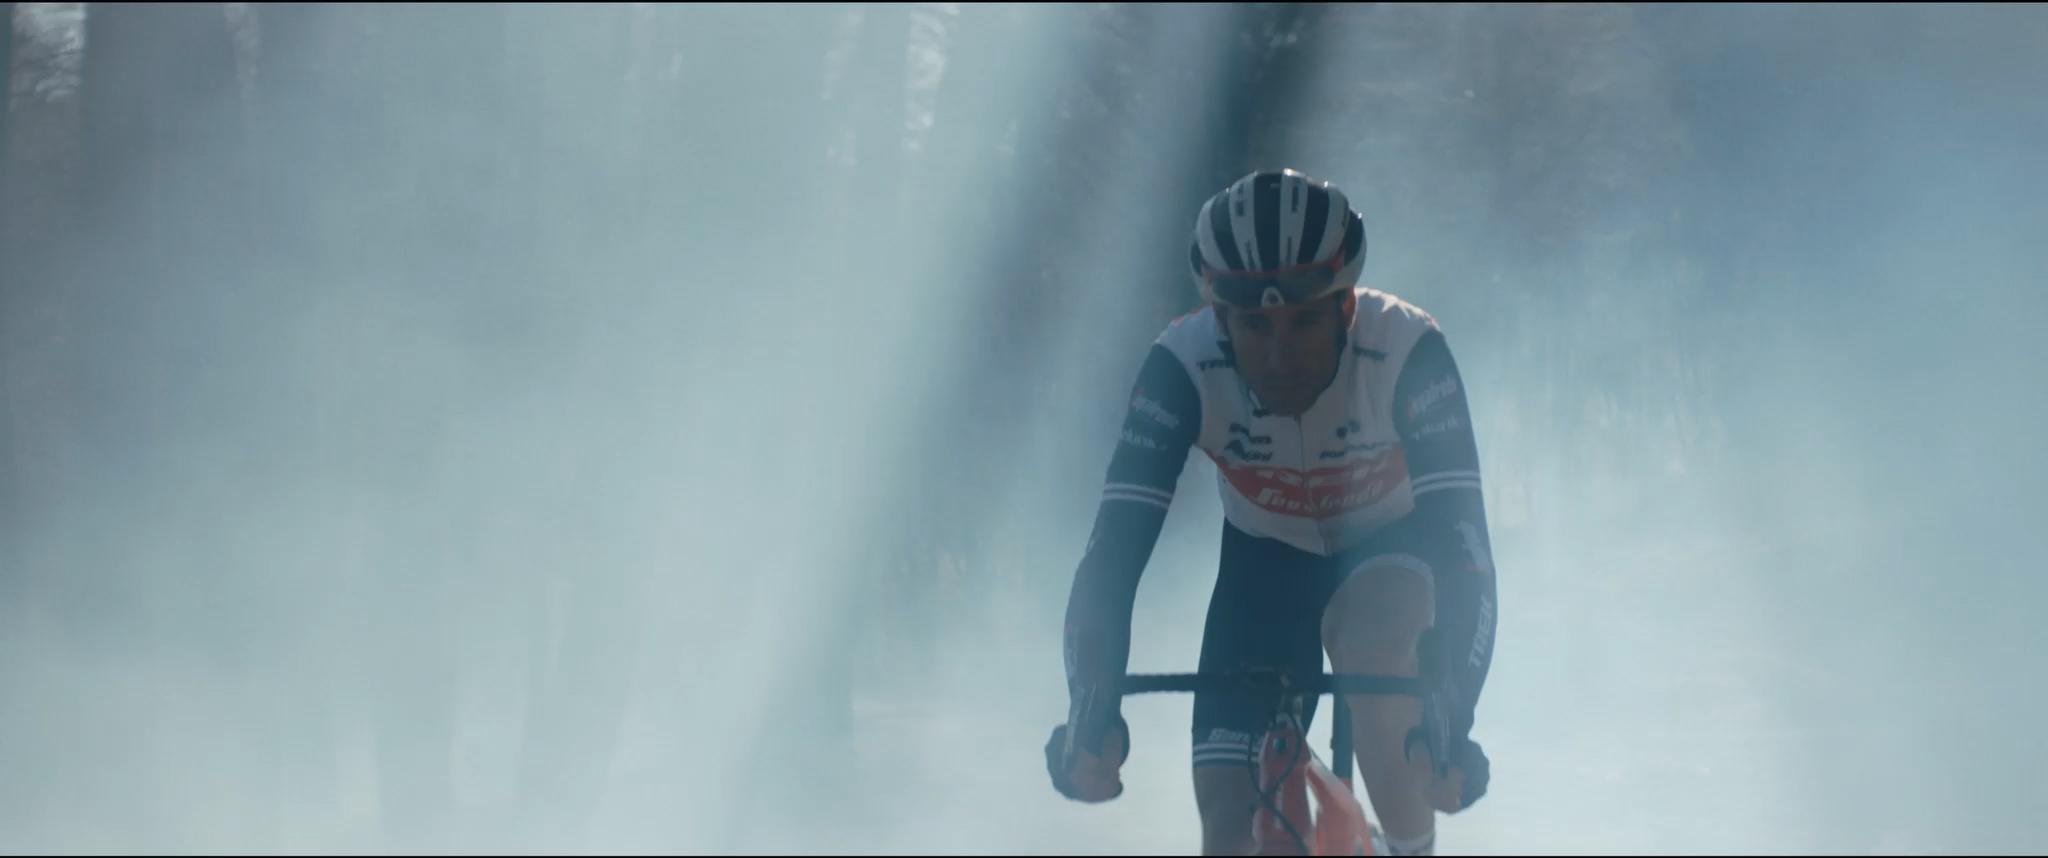 EBU ORO – Giro d'Italia 2020 (lo spot)